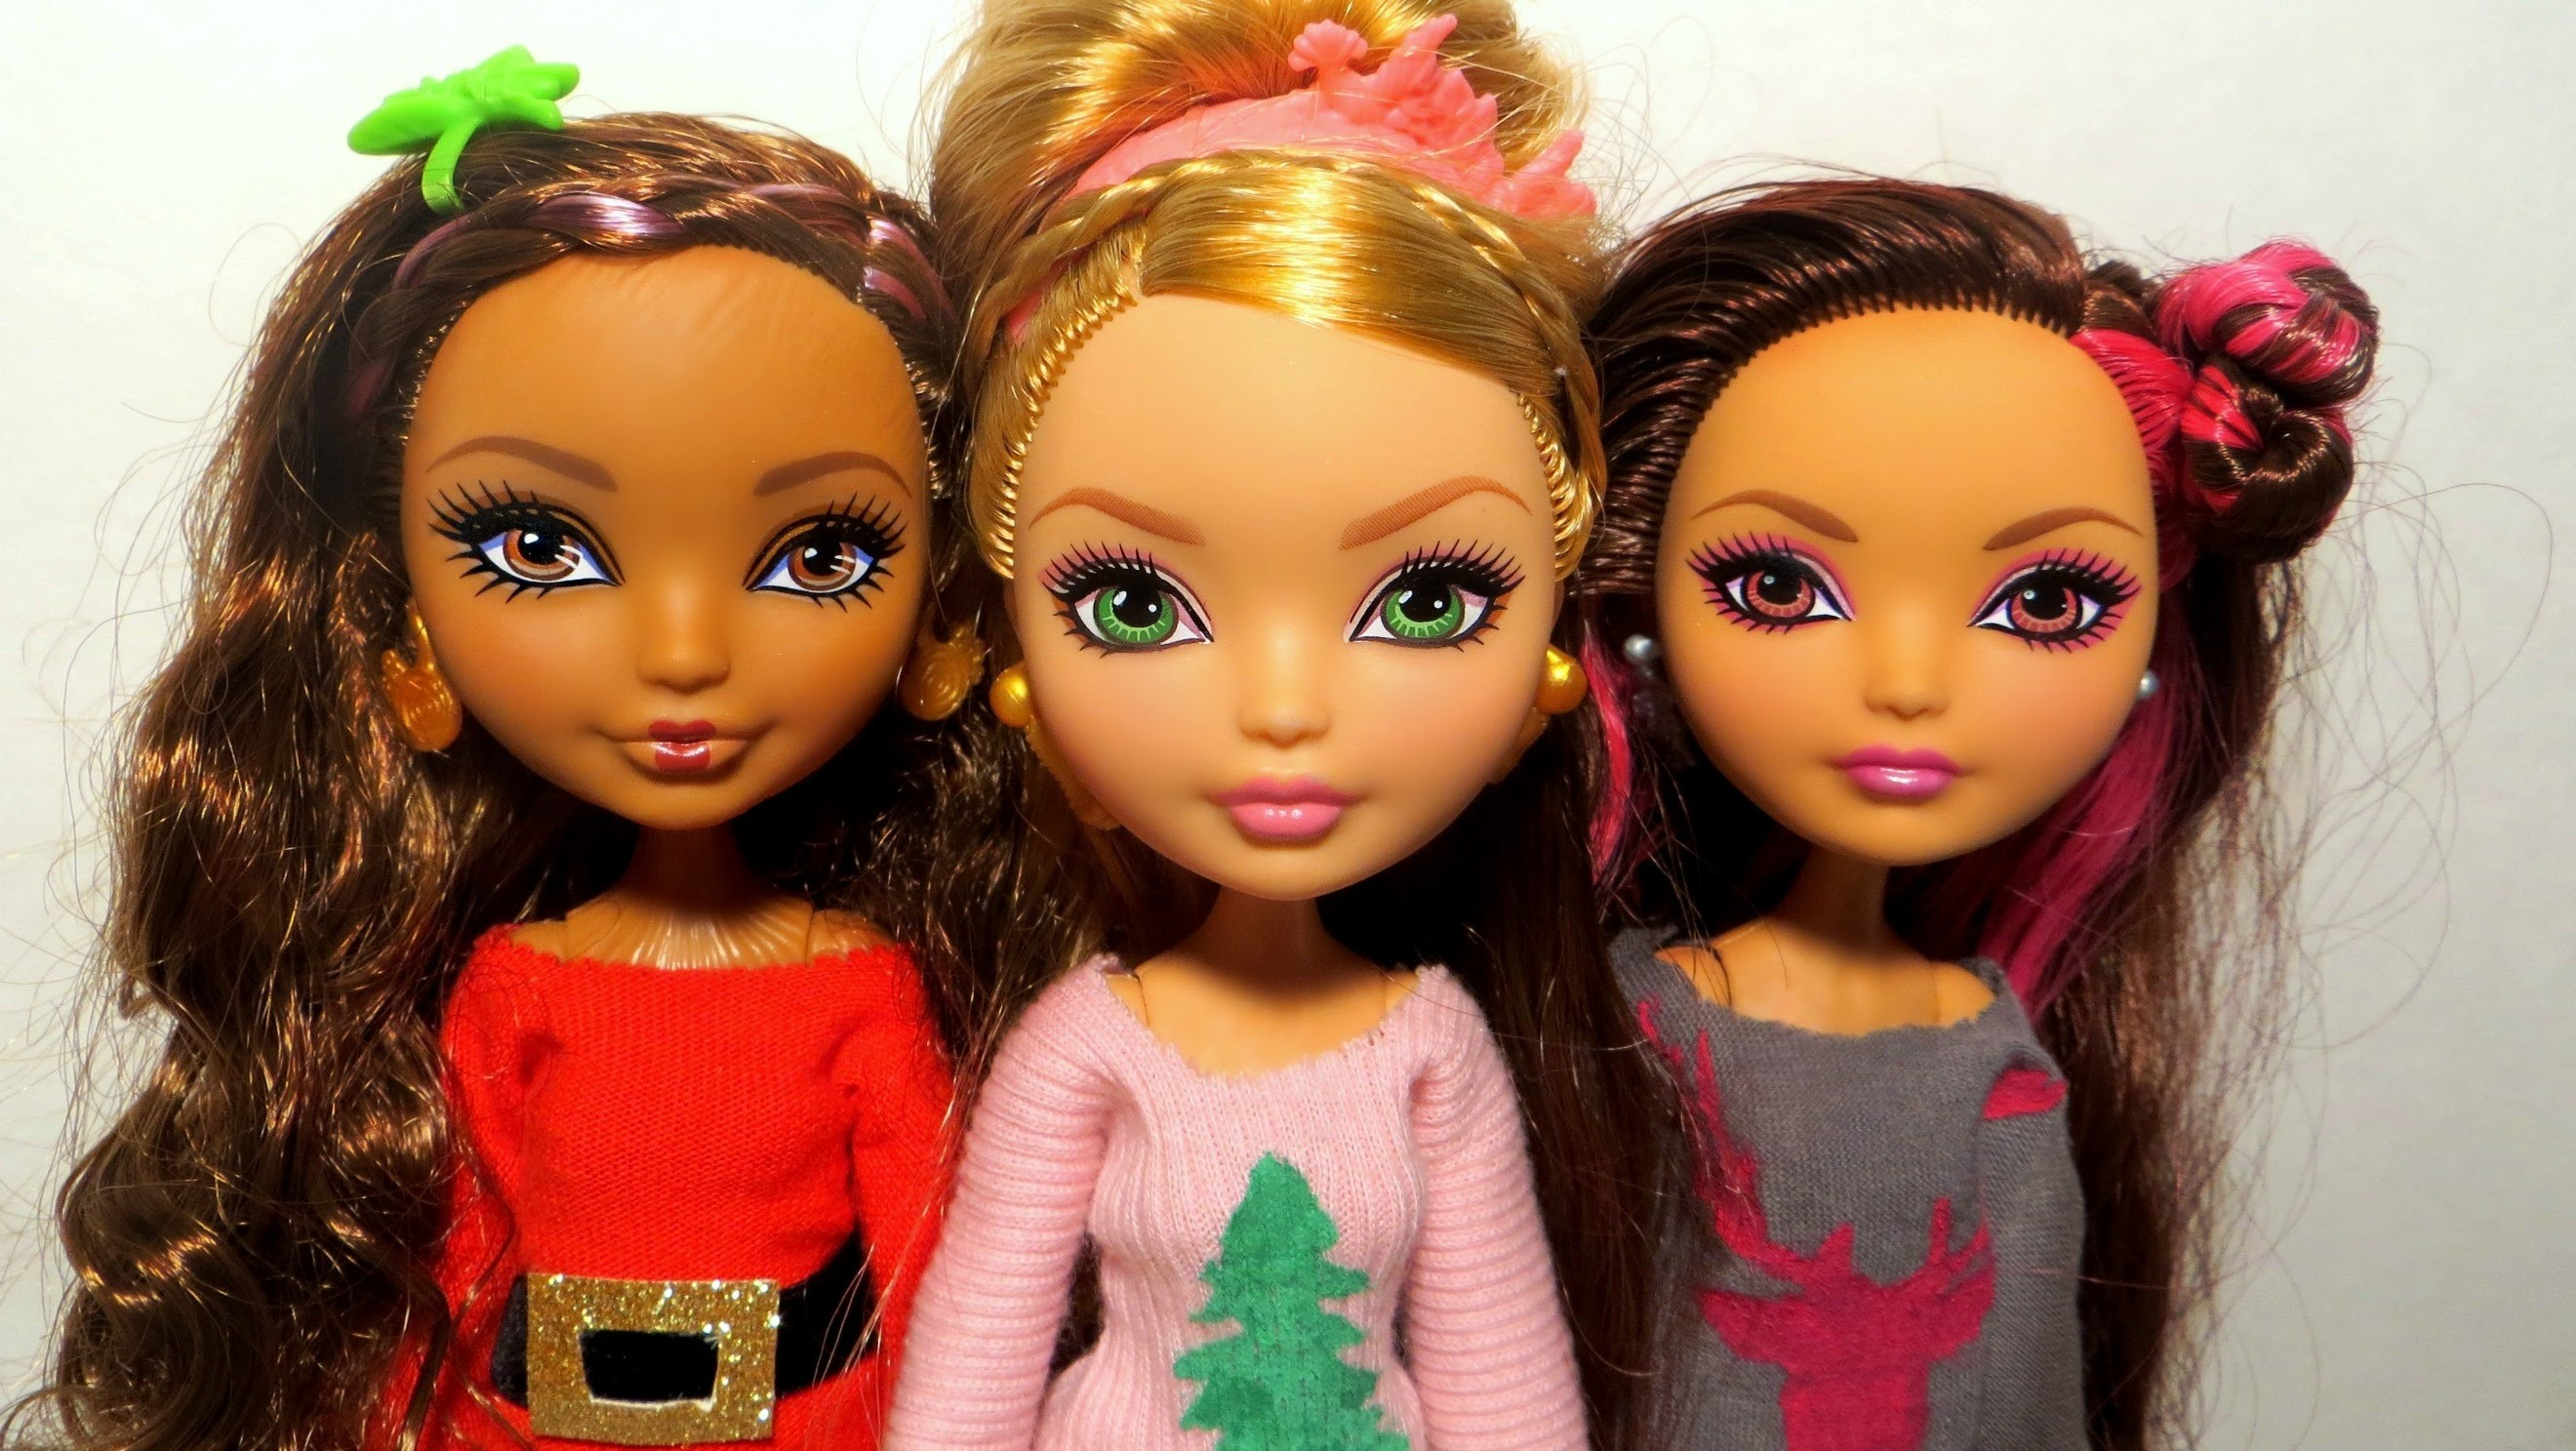 DIY Doll Holiday Sweater Tutorial